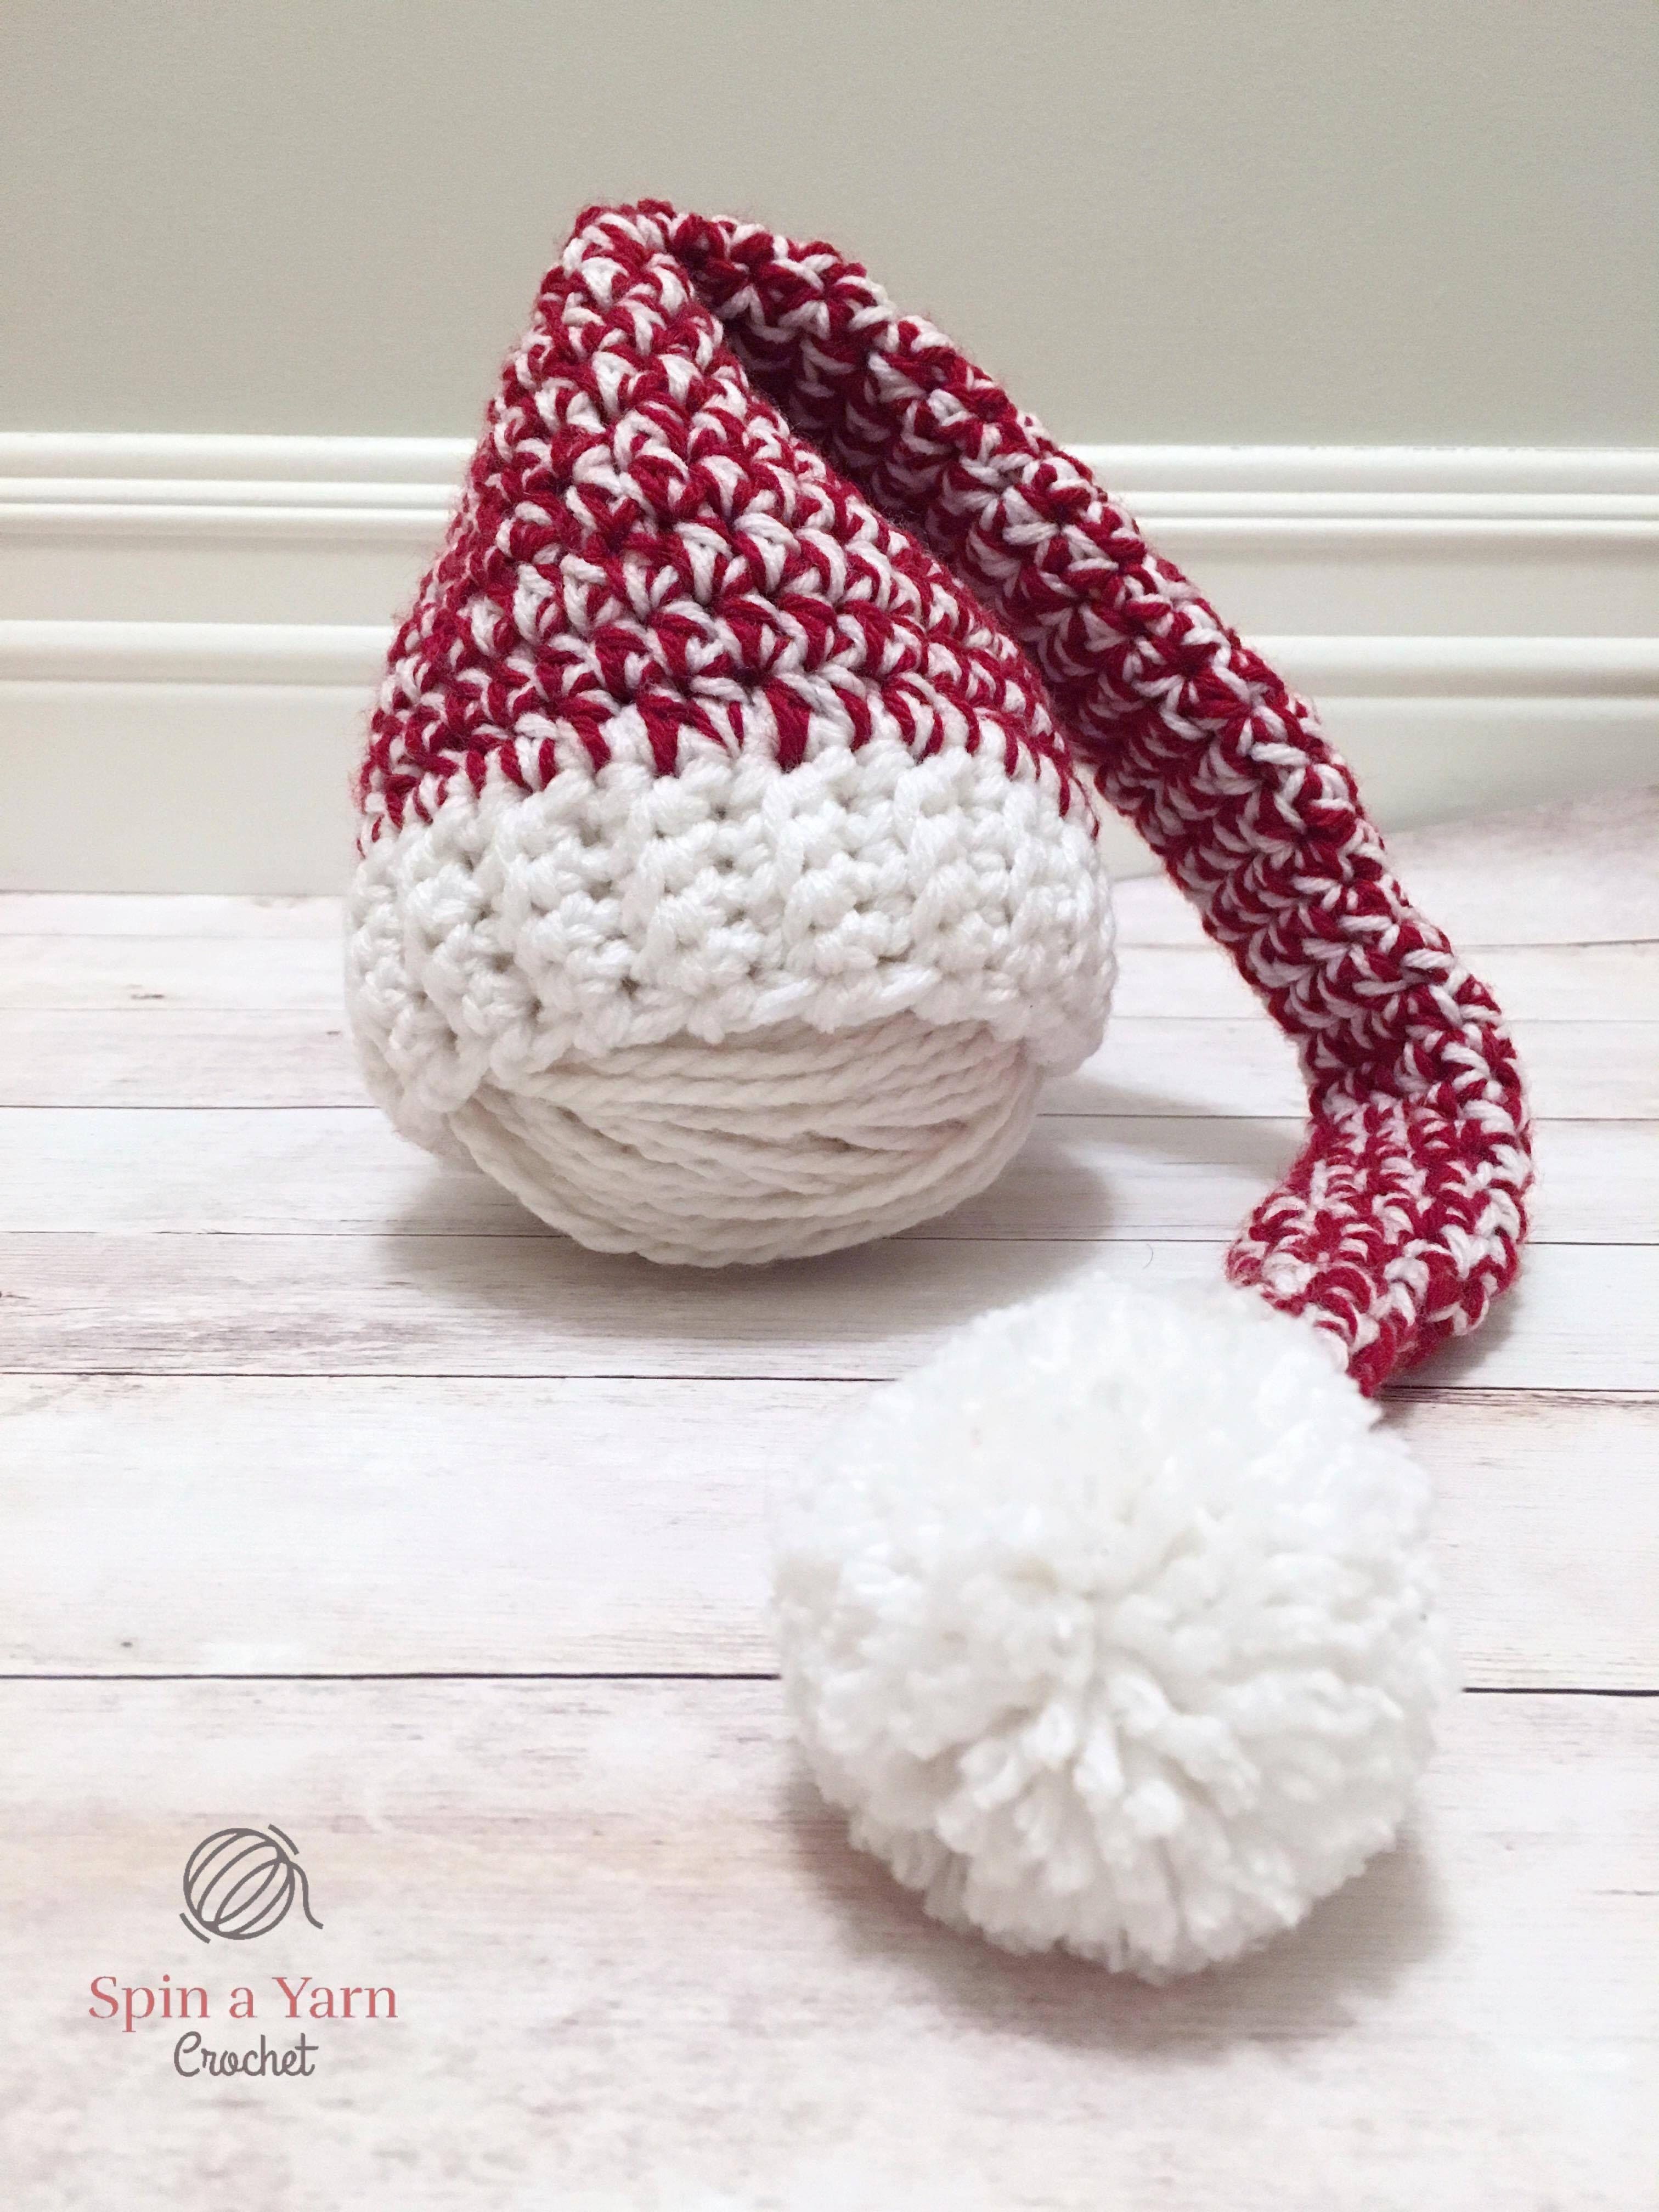 Newborn Elf Hat Free Crochet Pattern | Dimitra 2 | Pinterest